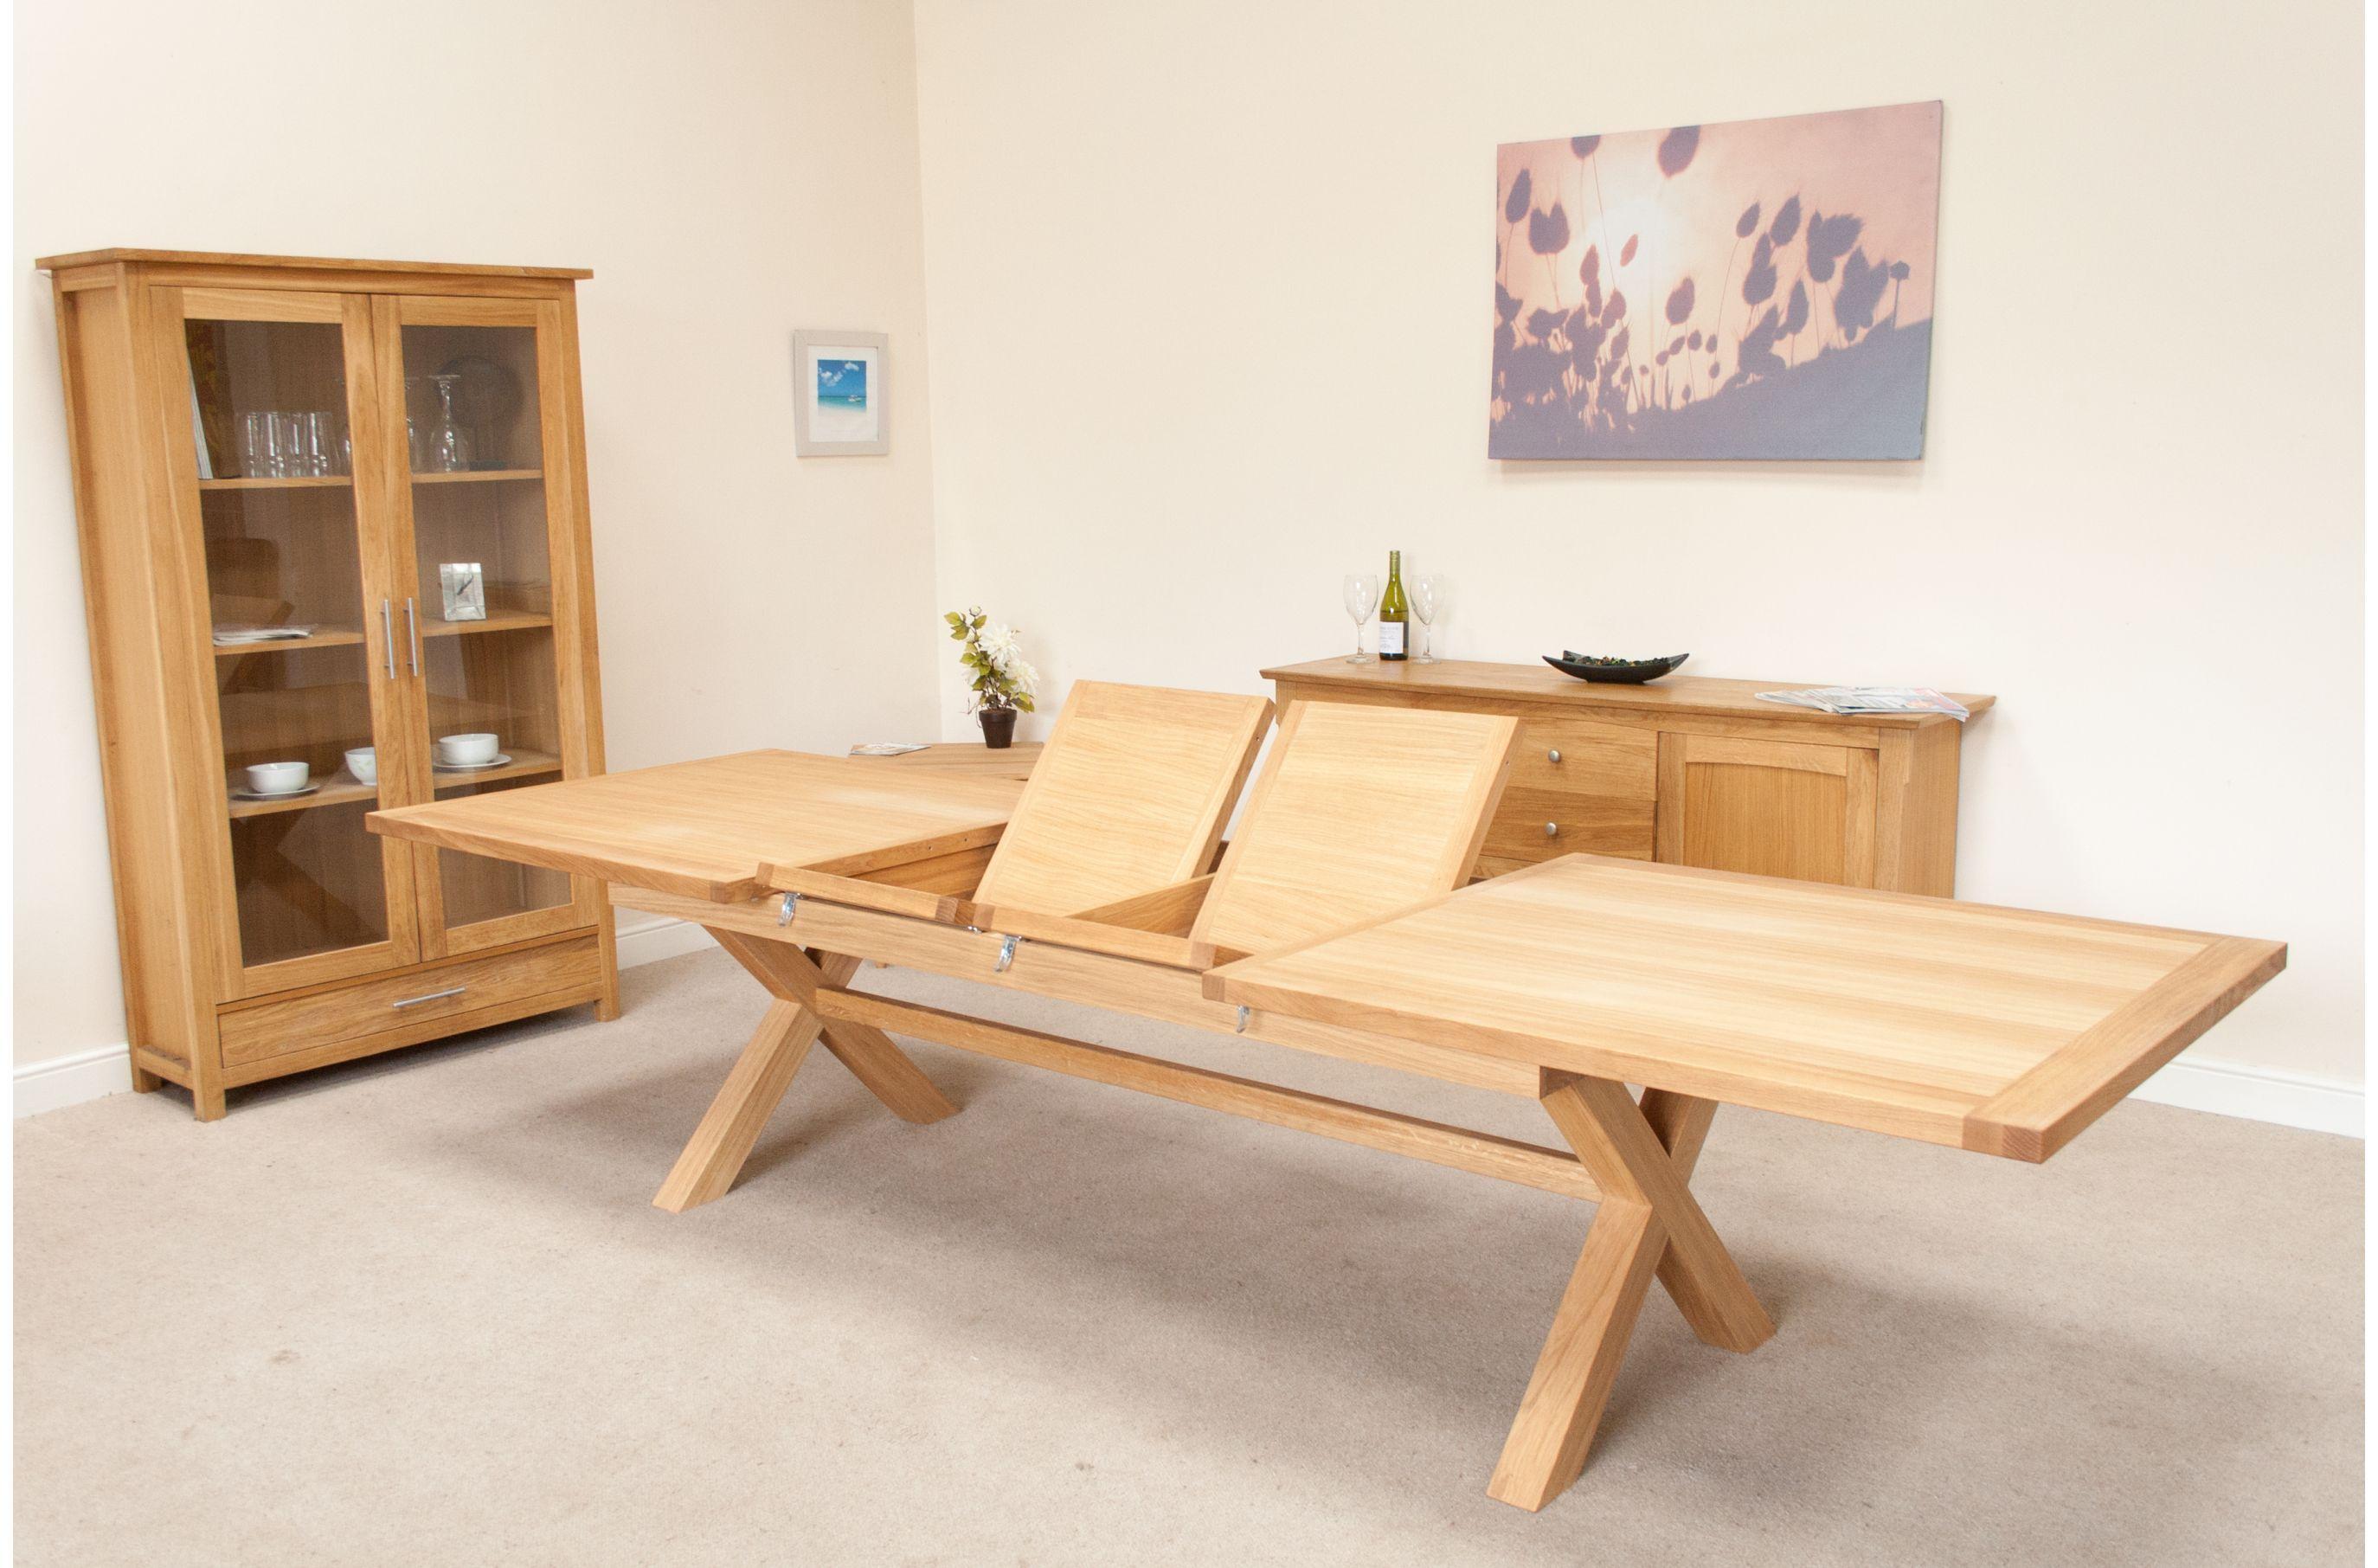 12 14 Seat Extending Oak Cross Leg Large Dining Table Mesas Extensibles Mesas